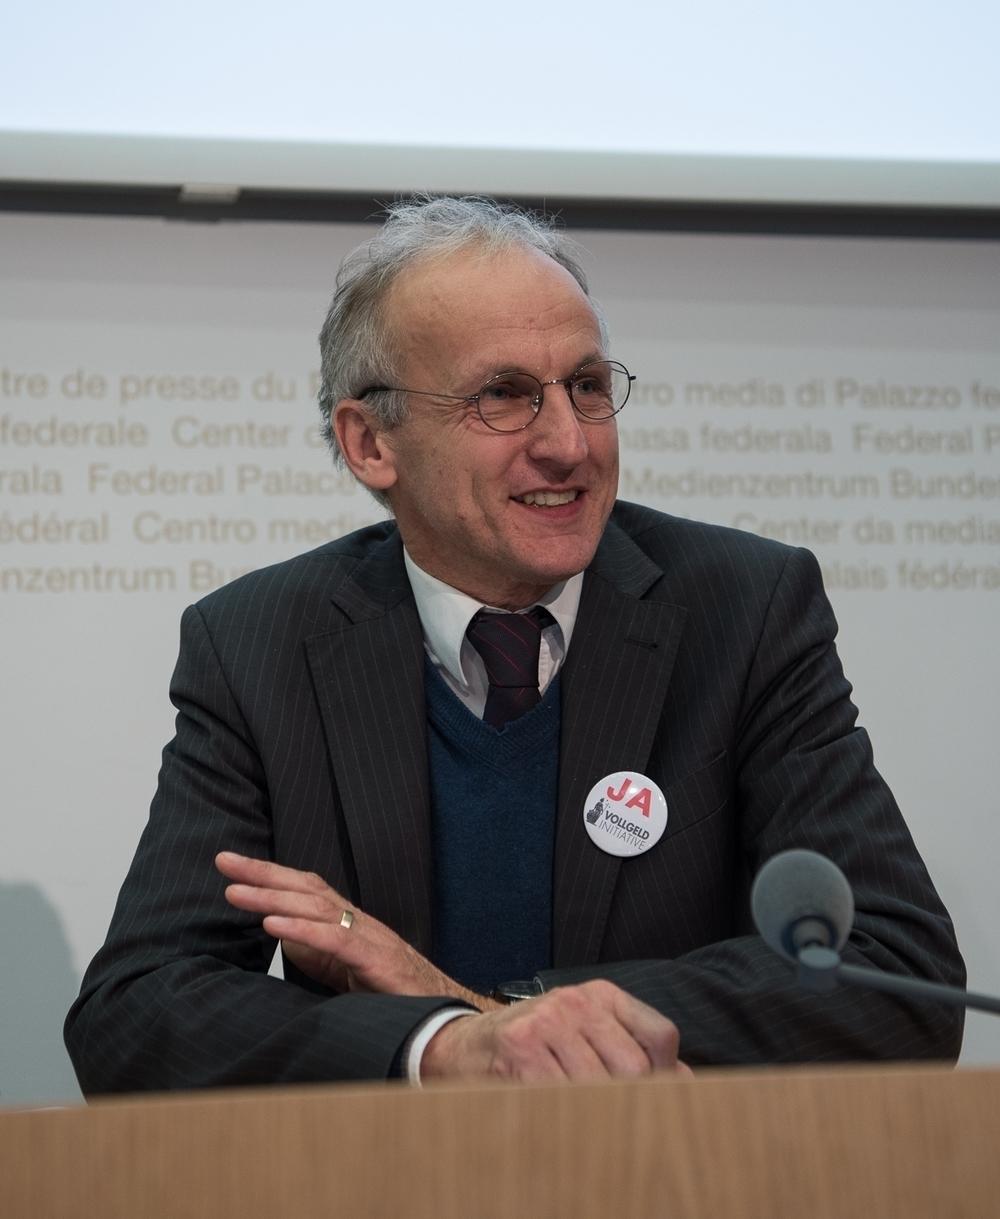 Klaus Karwat